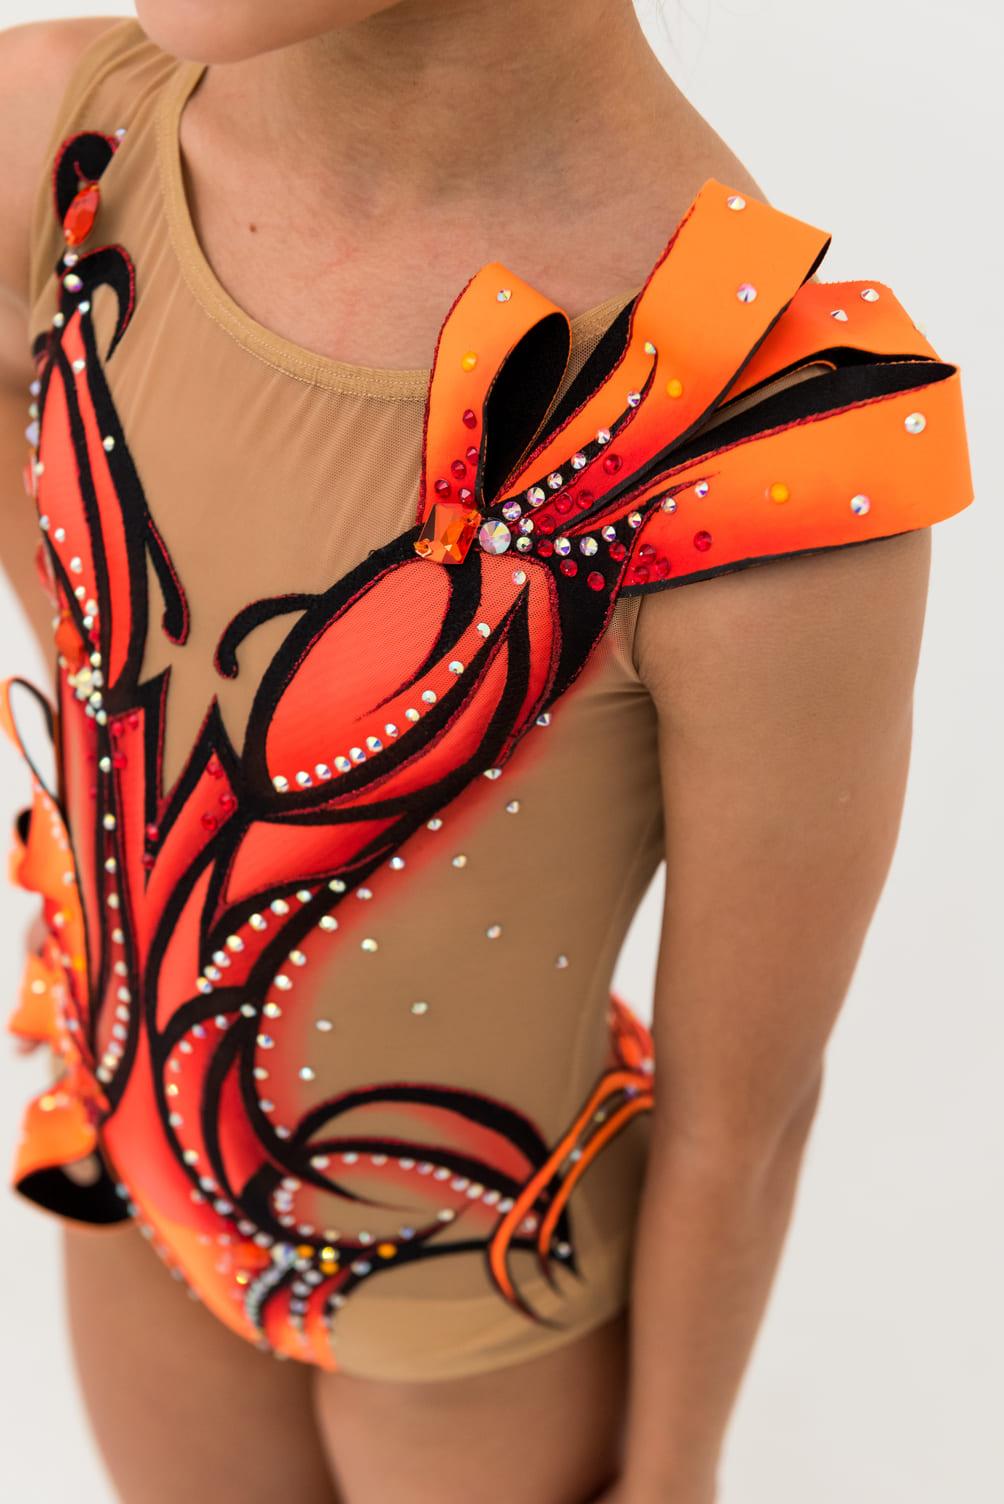 Leotards, Flower Fantasy Orange, pic 3